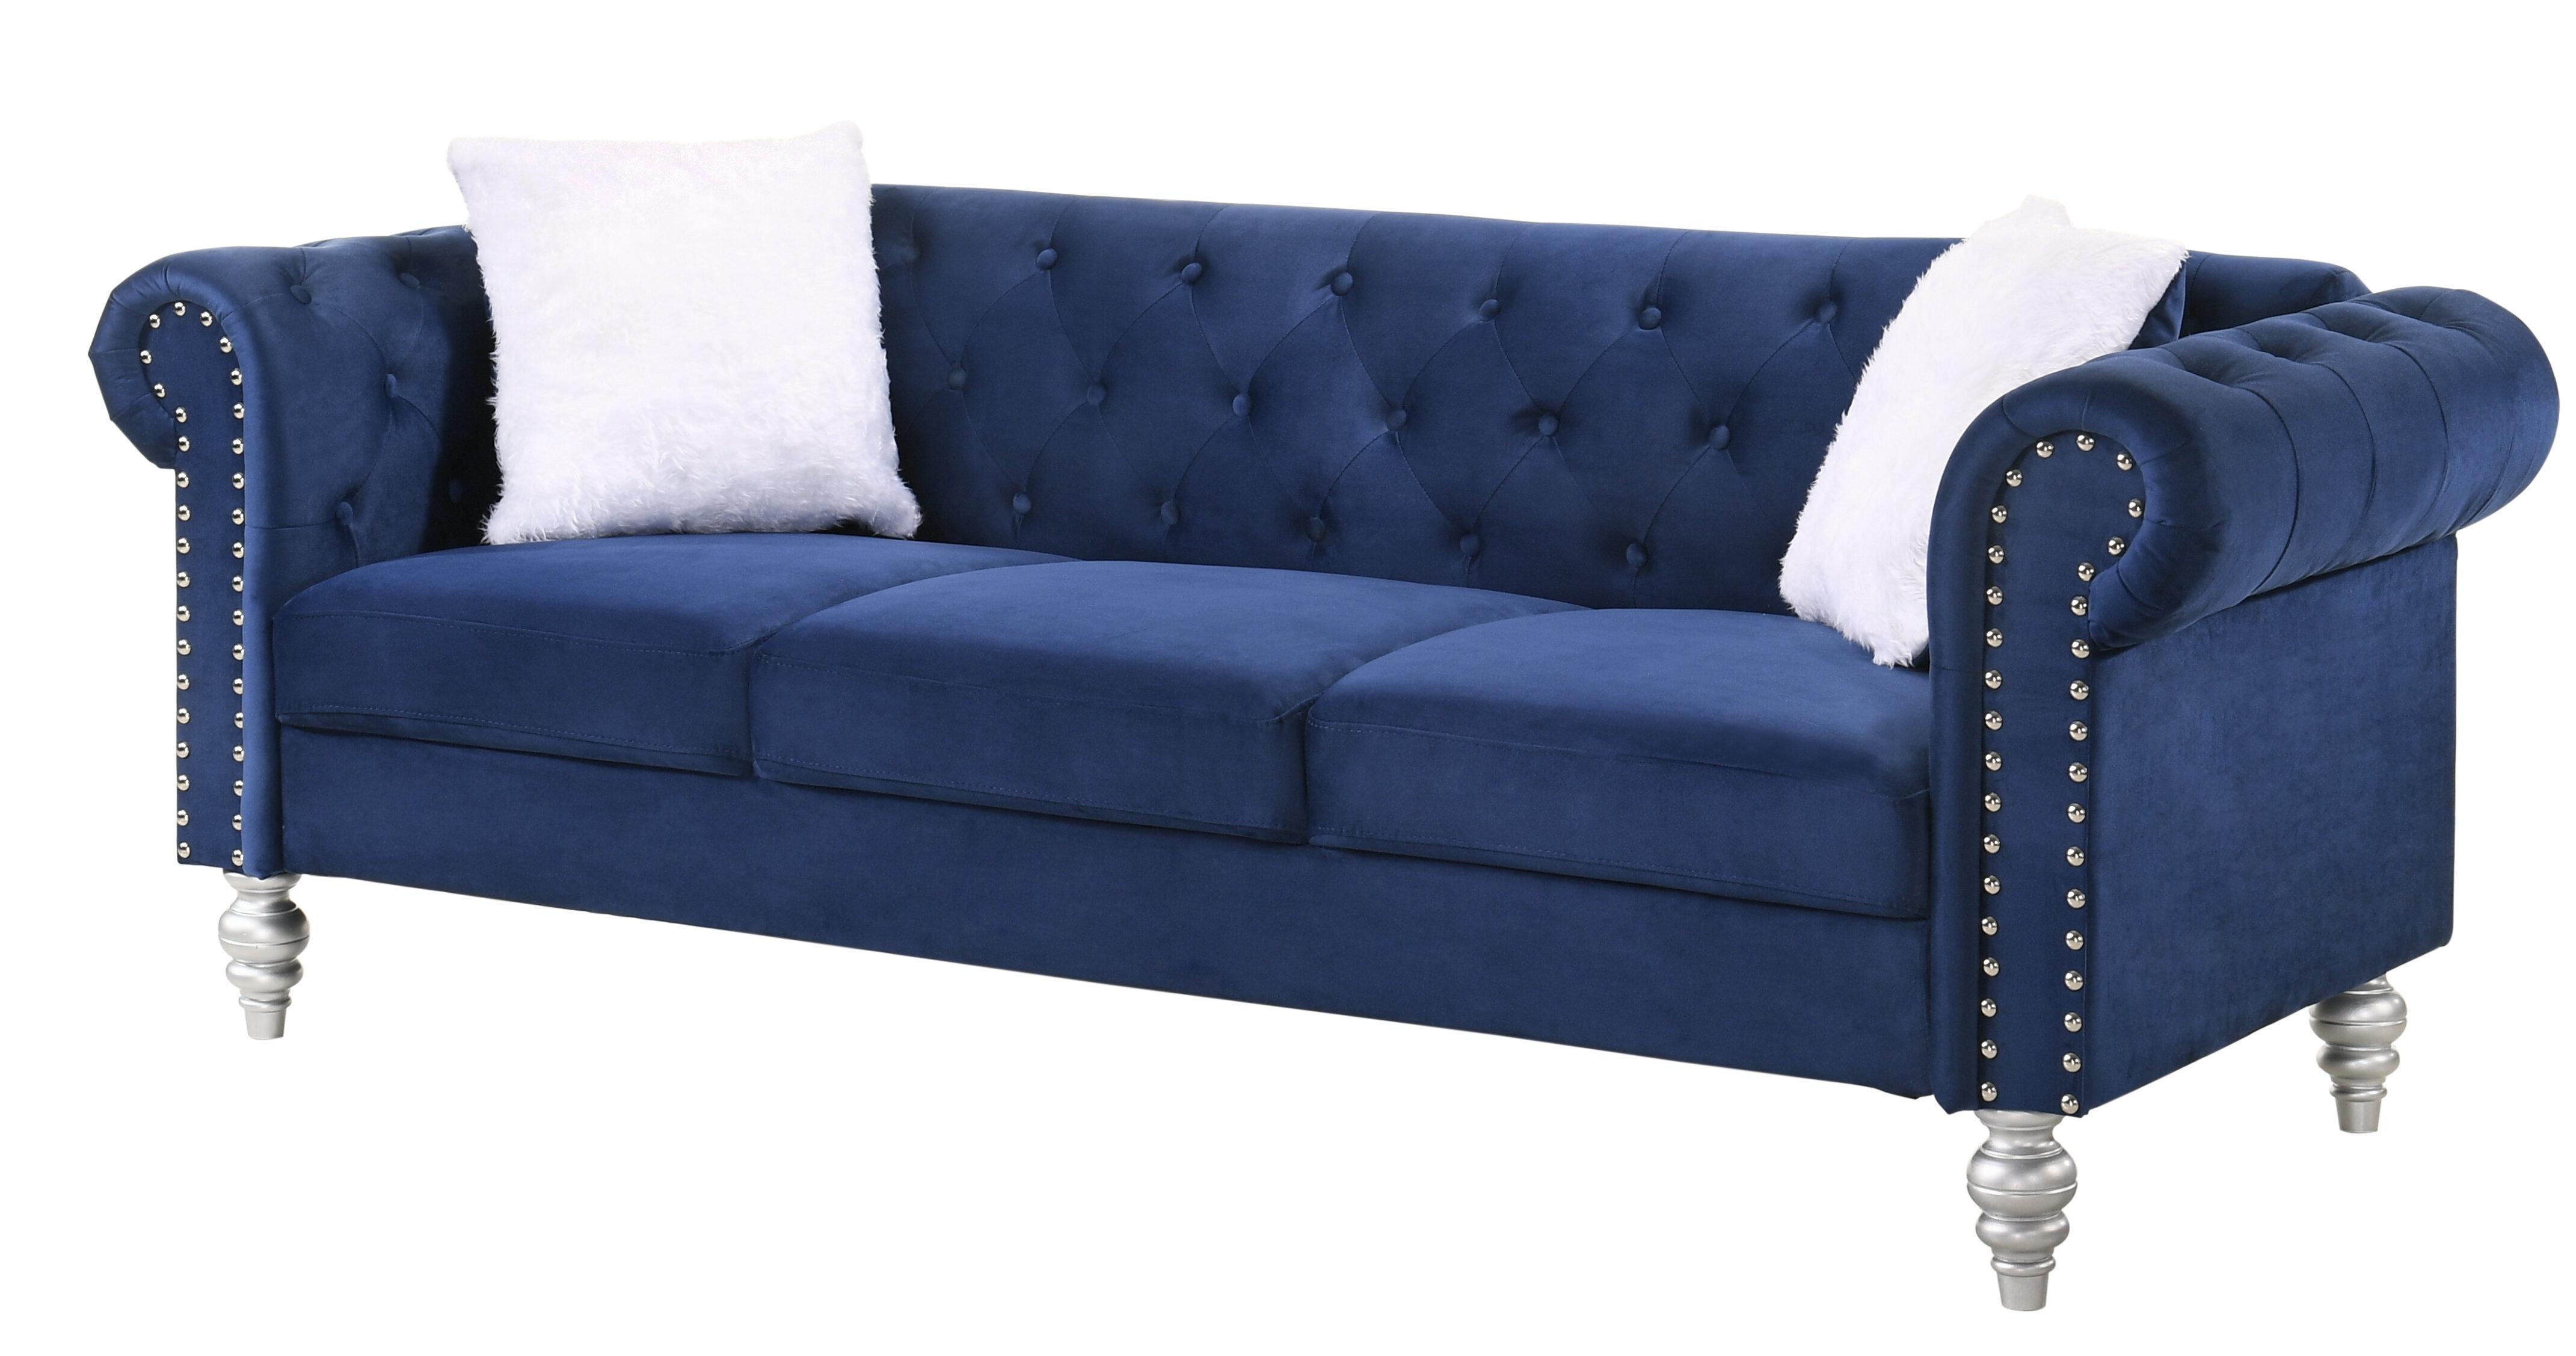 Rosdorf Park Tena Velvet 83 Wide Rolled Arm Chesterfield Sofa Reviews Wayfair